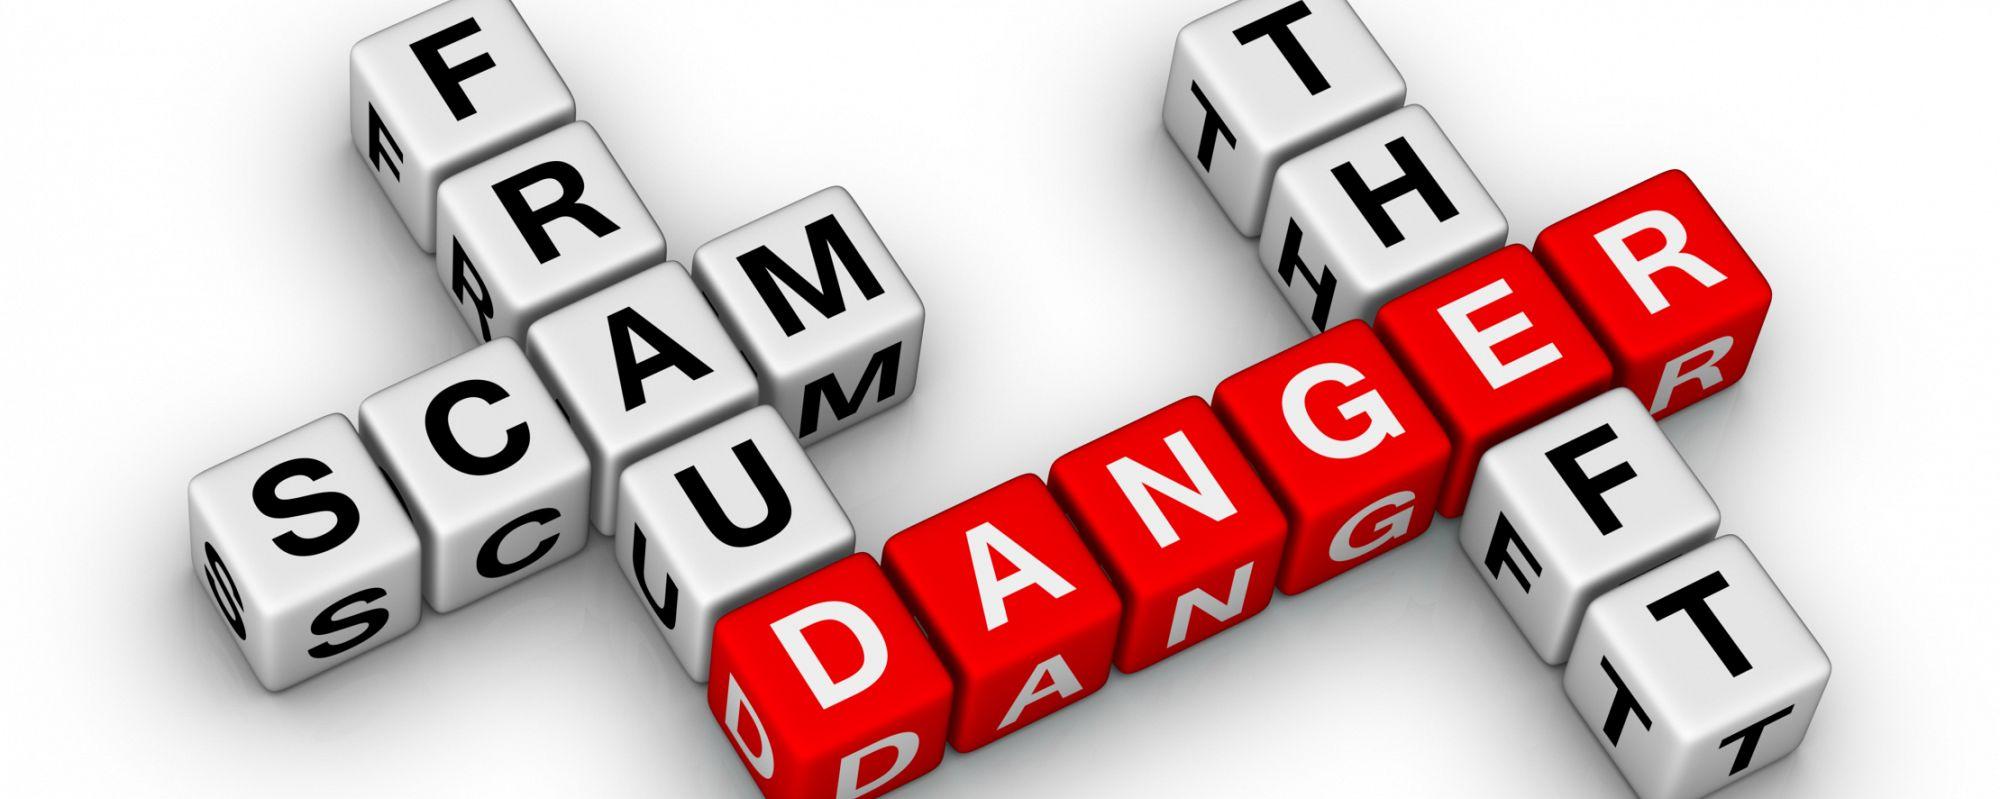 Ciri Ciri Penipuan Online Pelajari Dari Sekarang Blog Kredibel